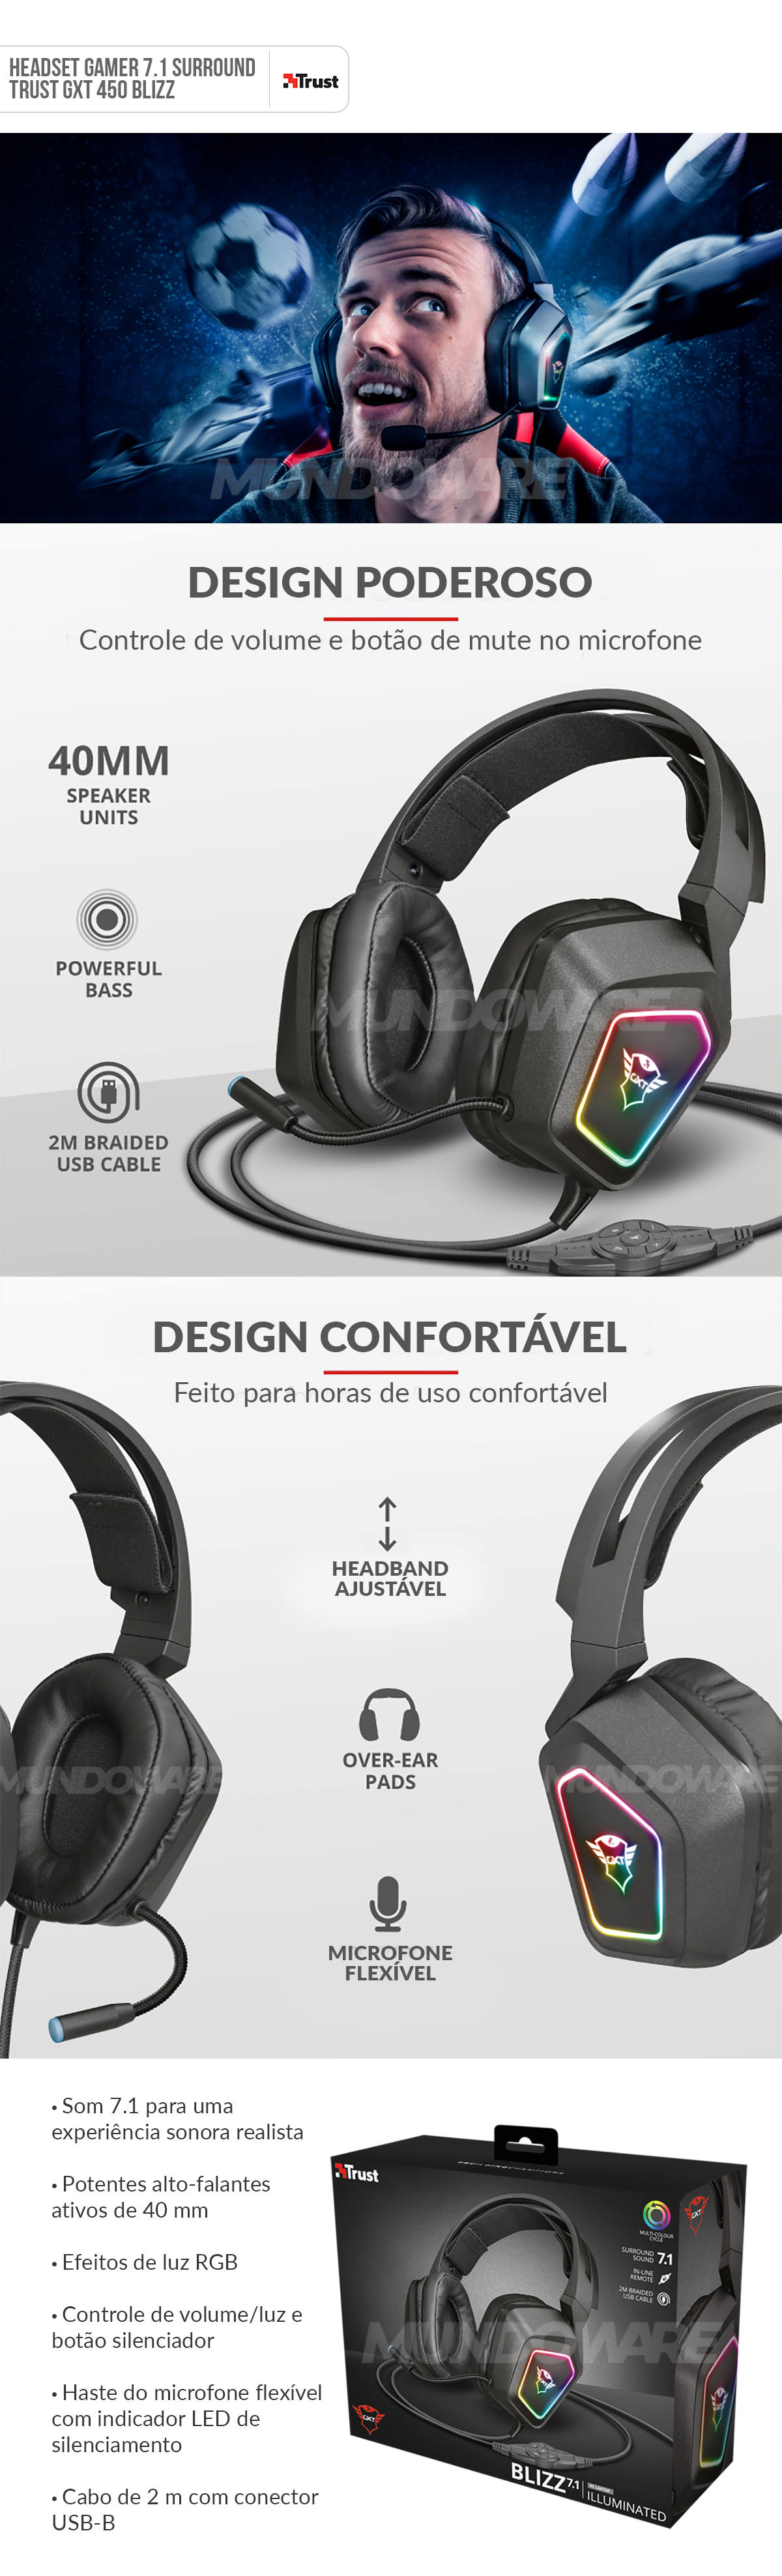 Headset Gamer 7.1 Surround Alta Fidelidade Sonora e Graves Potentes RGB Trust Blizz GTX-450 Gaming